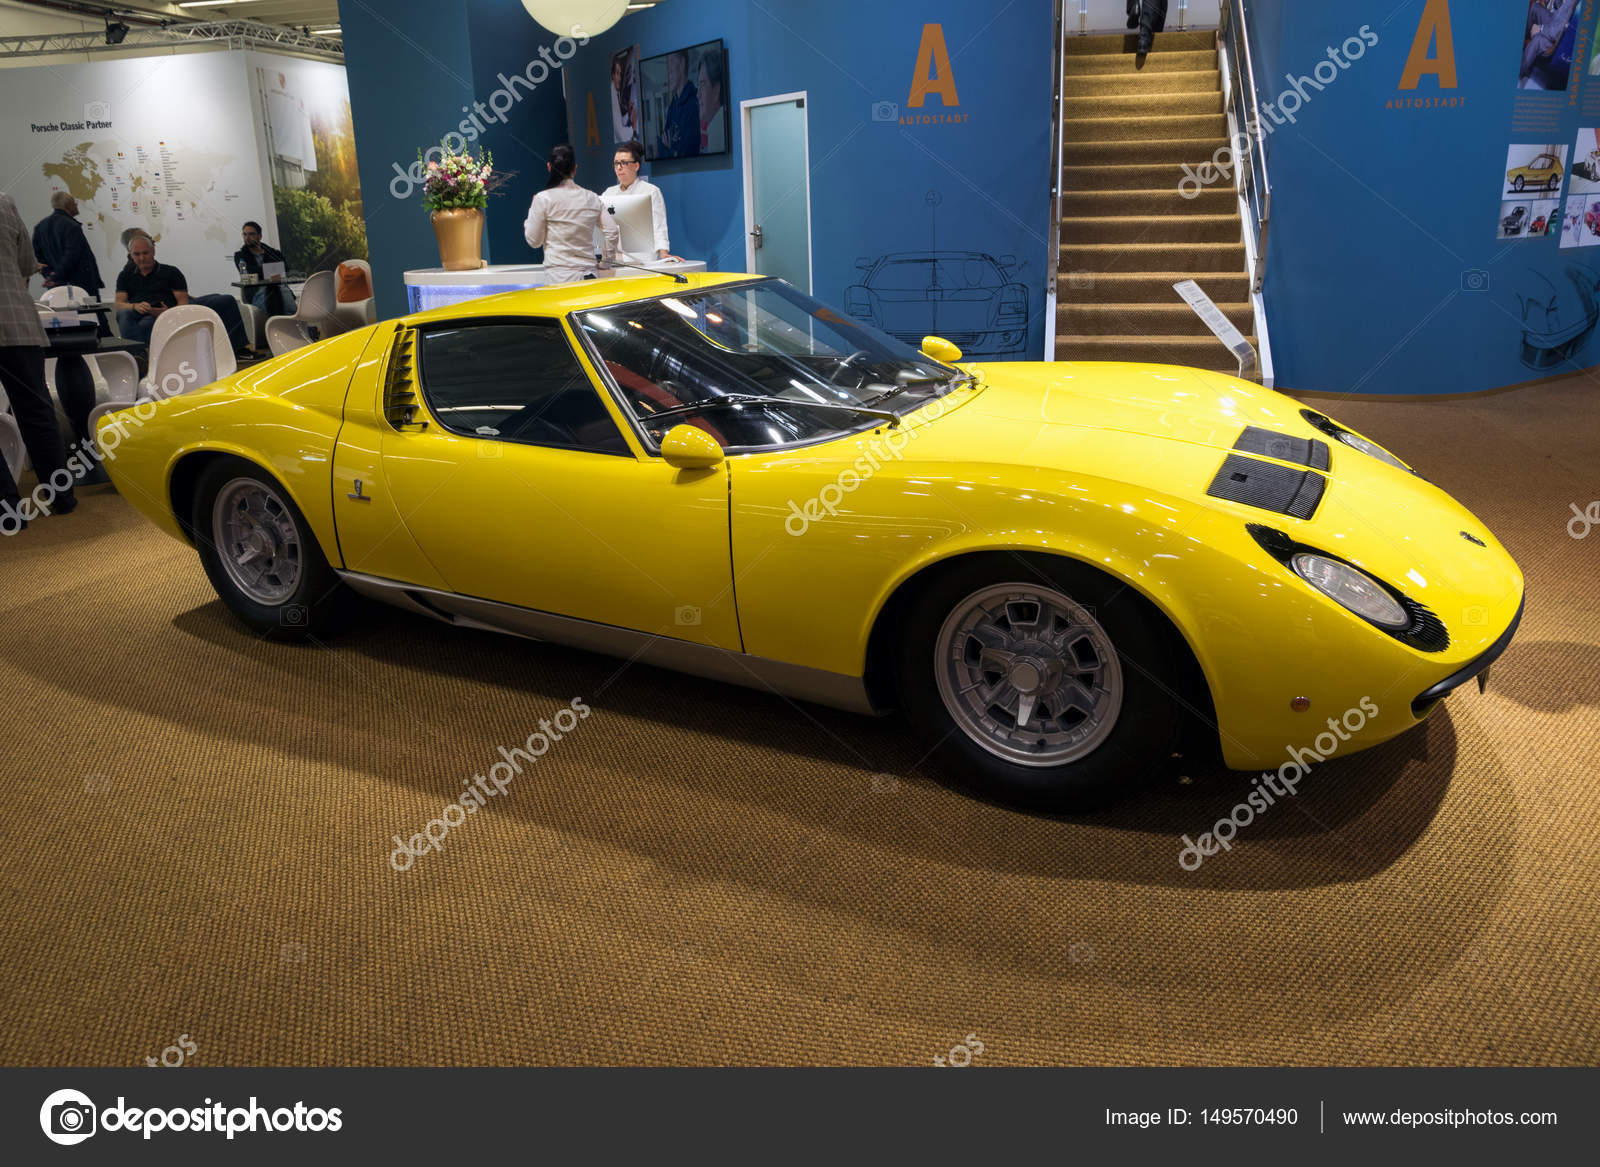 1967 Lamborghini Miura P400 Vintage Sports Car Stock Editorial Photo C Foto Vdw 149570490